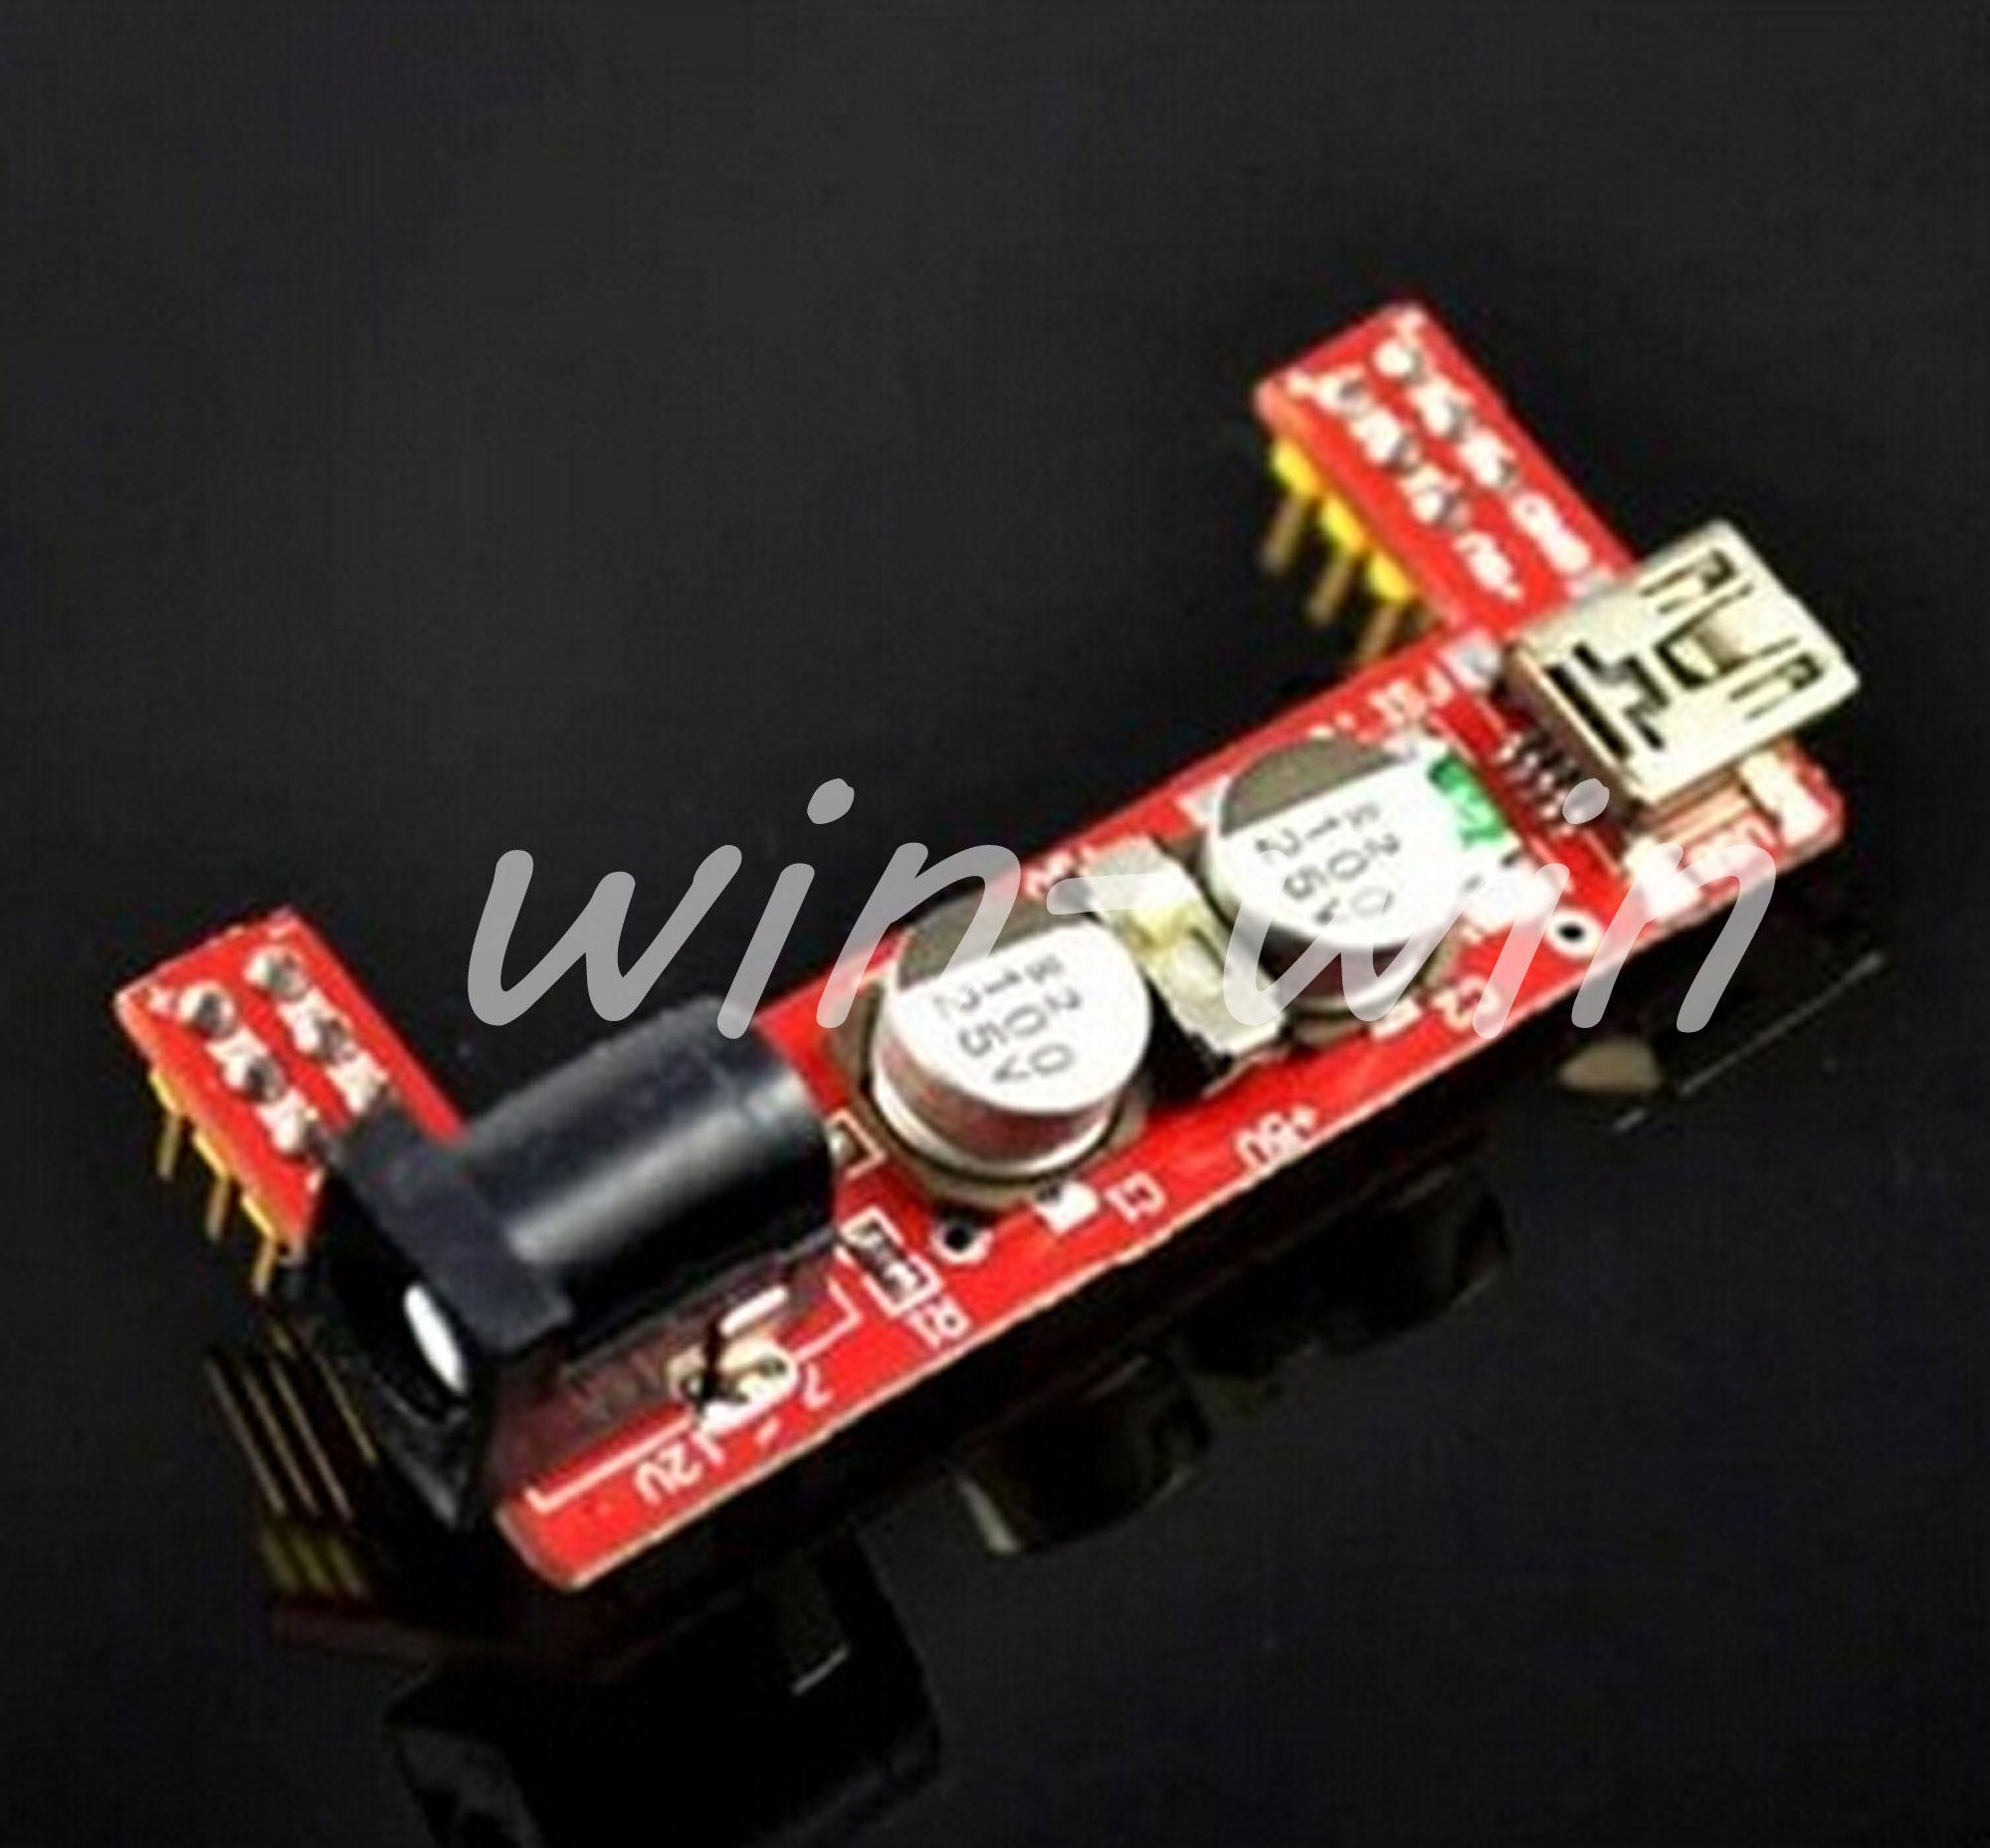 Problem With Nrf24l01 Pa Lna Gateway Sensor Connection